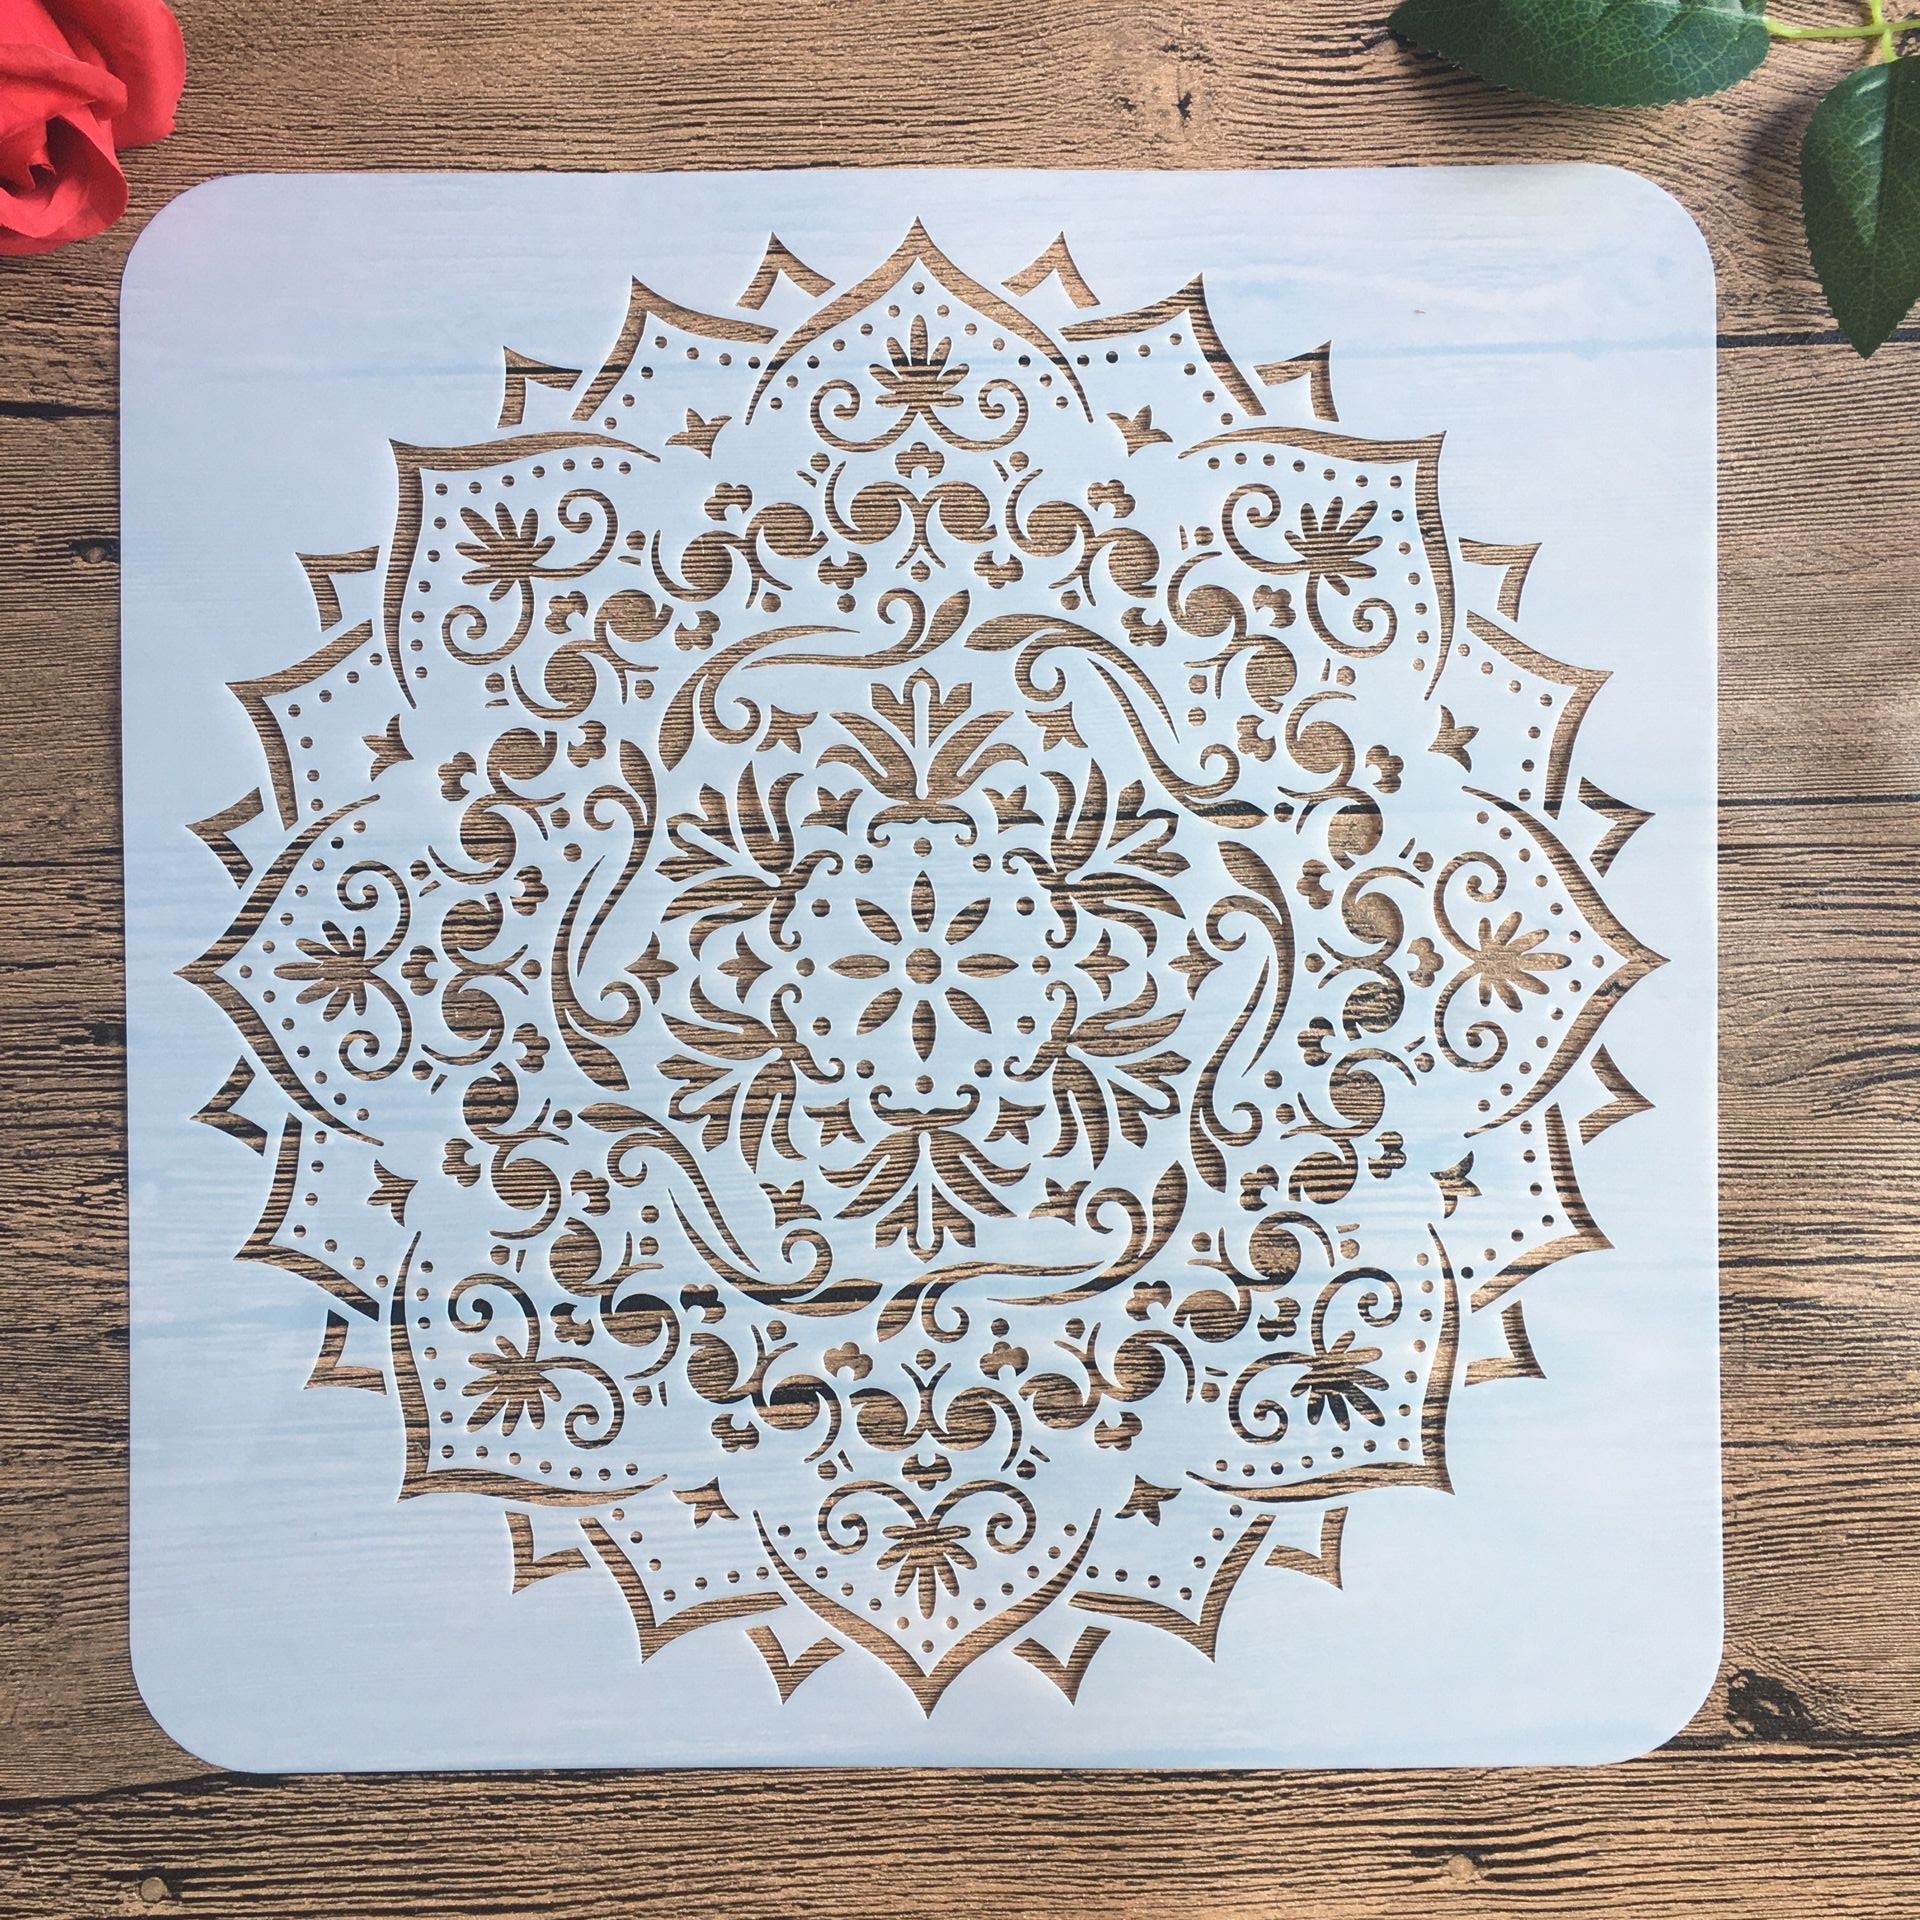 30 * 30 Cm Large Round Flower Mandala Diy Stencil Painting Scrapbook Coloring Engraving Album Decoration Template Stencil -h